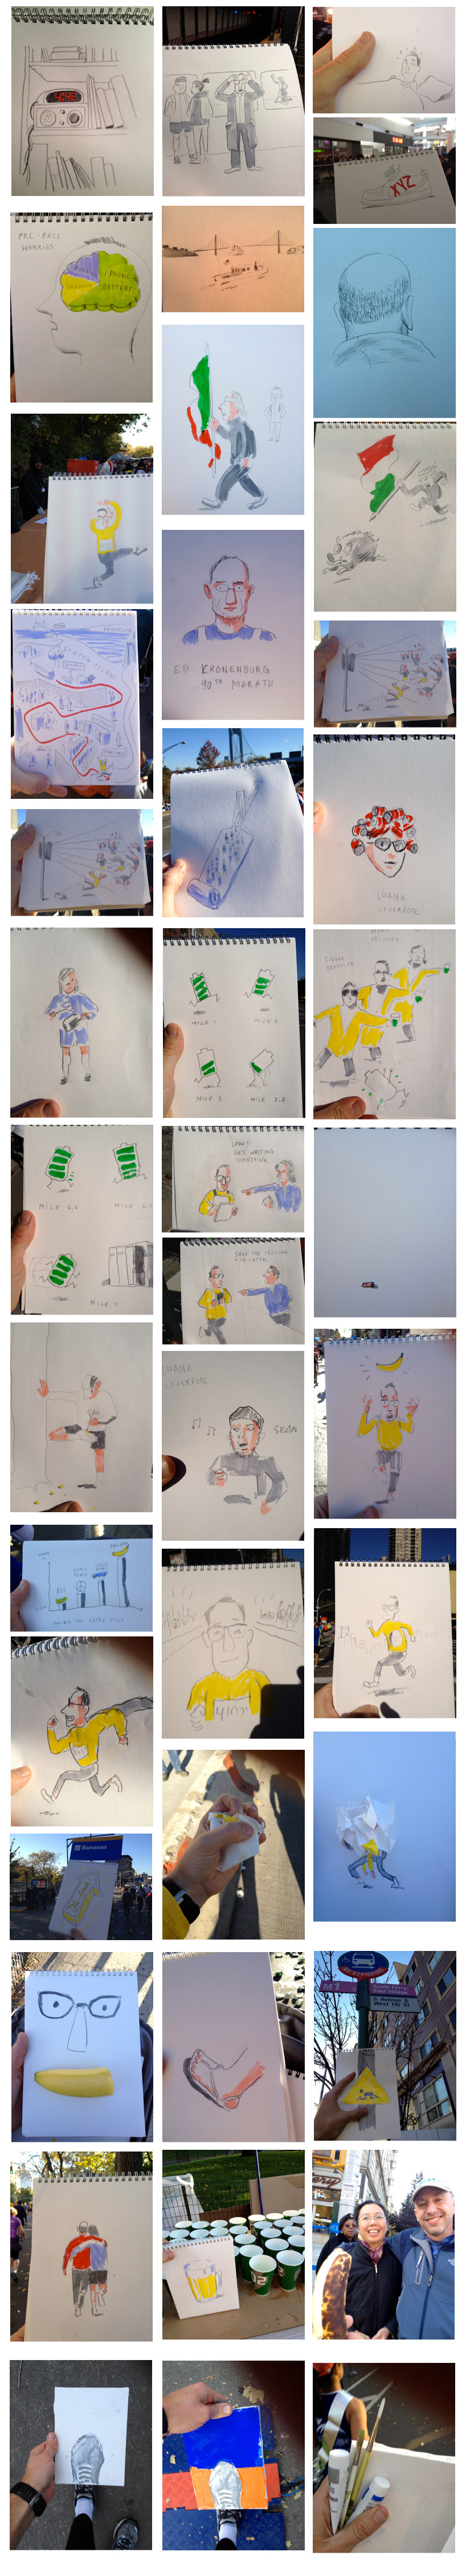 26.1 Miles, 45 Sketches :: Christoph Niemann